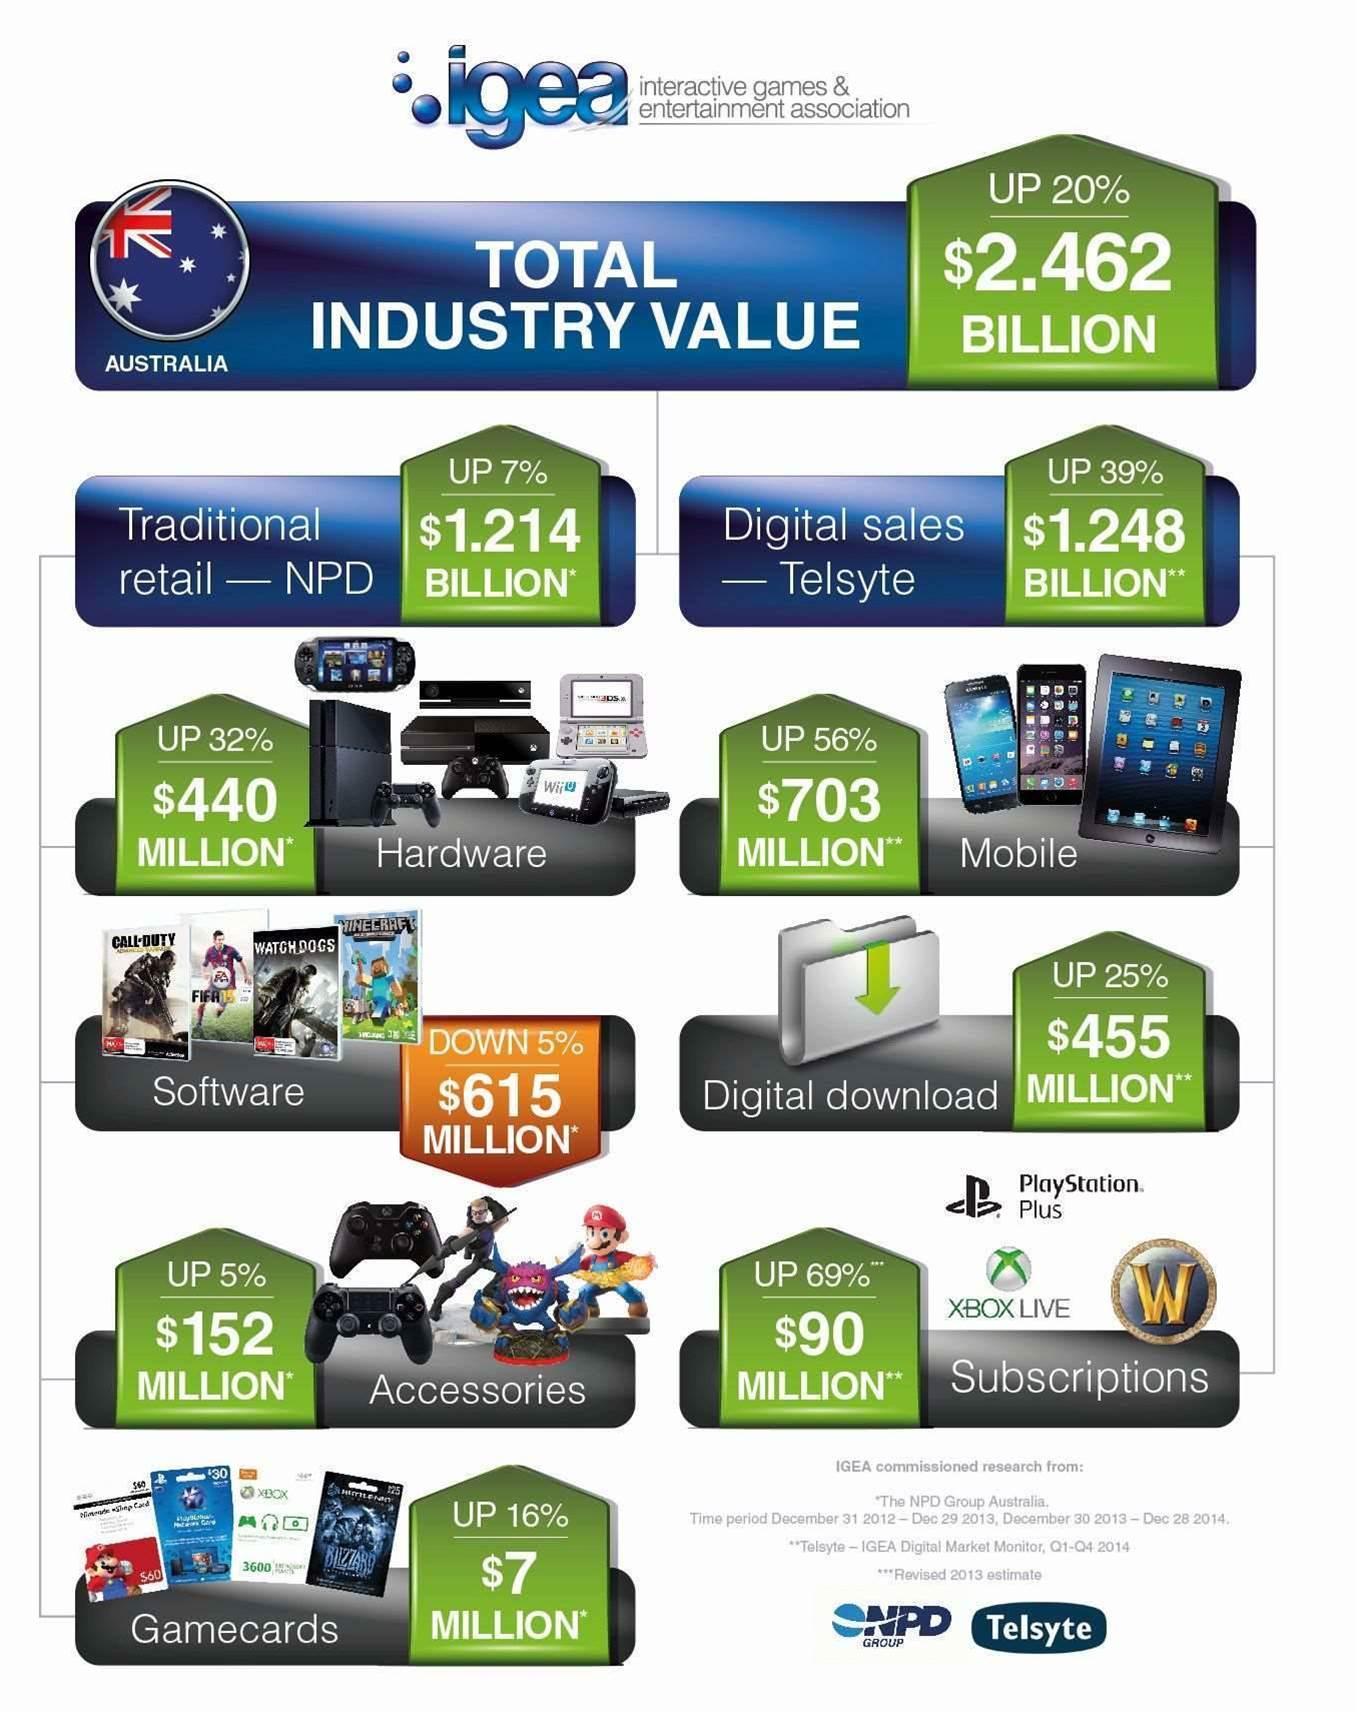 PC game sales slump as digital sales soar